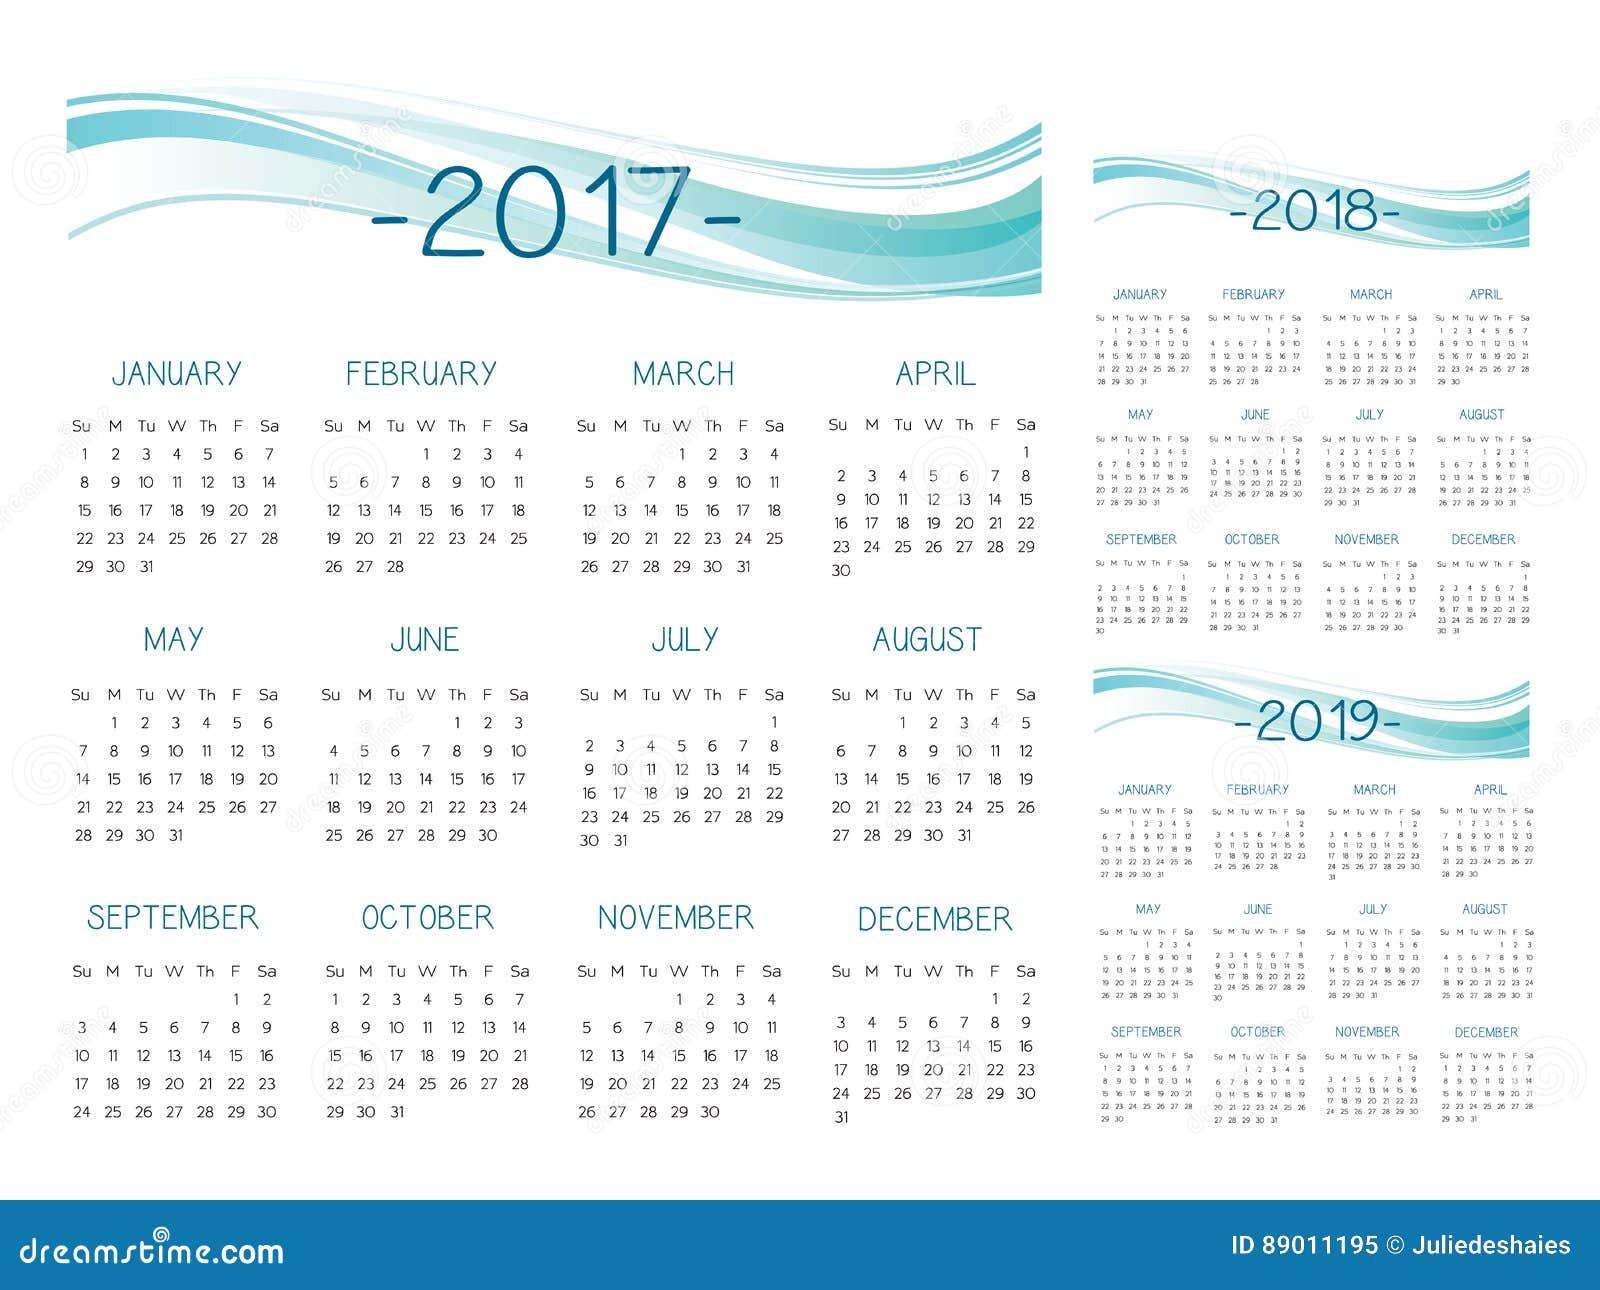 August 14 15 16 17 18 19 20 Monday August 15 2016 5 AM 6 AM